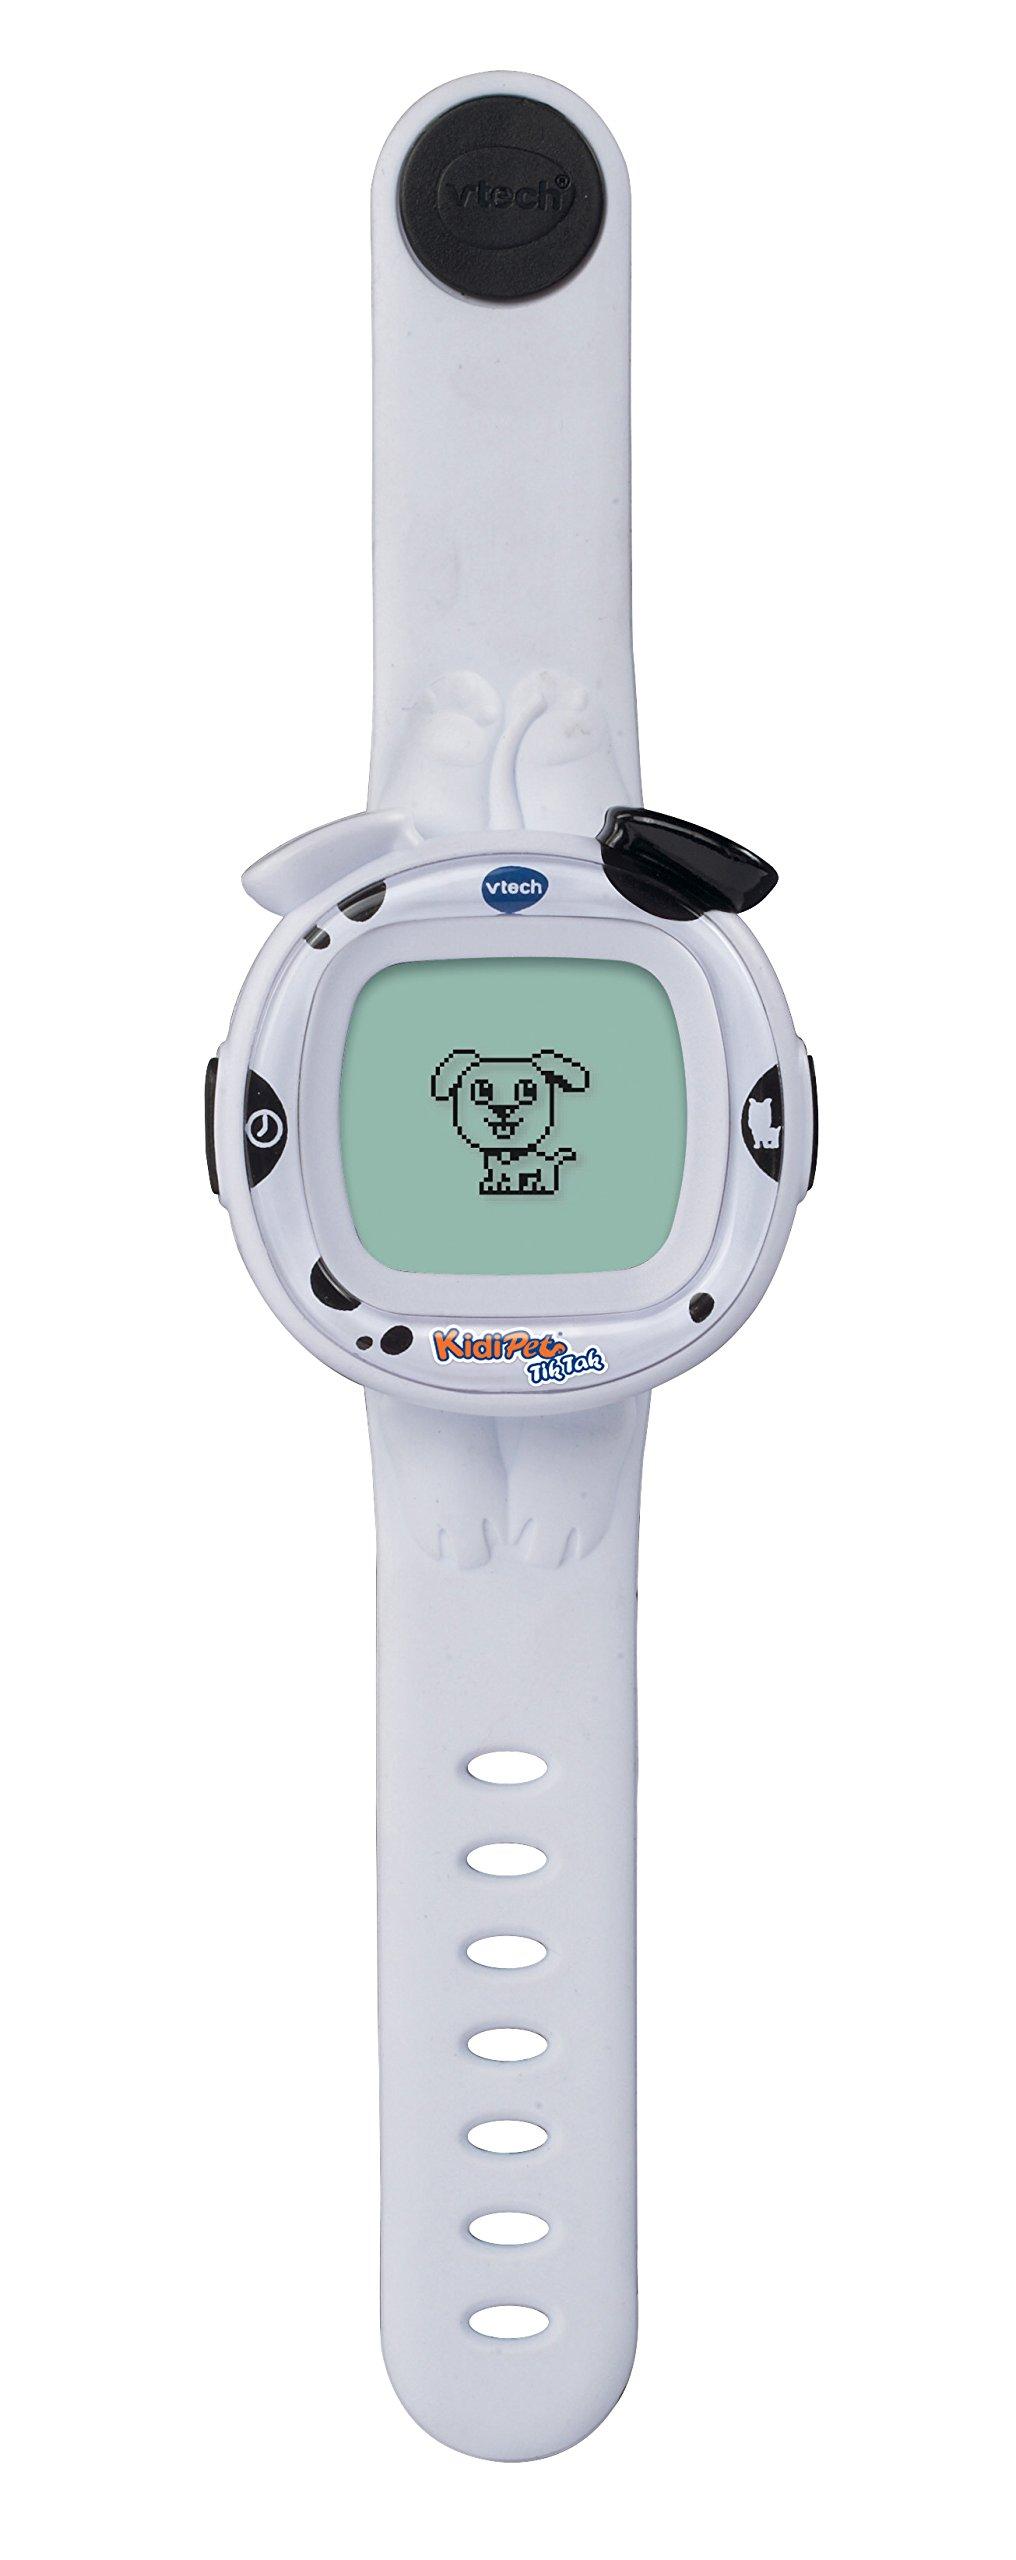 Vtech - 170505 - Animal Interactif - Kidipet Tik Tak Friend - Dalmatien product image